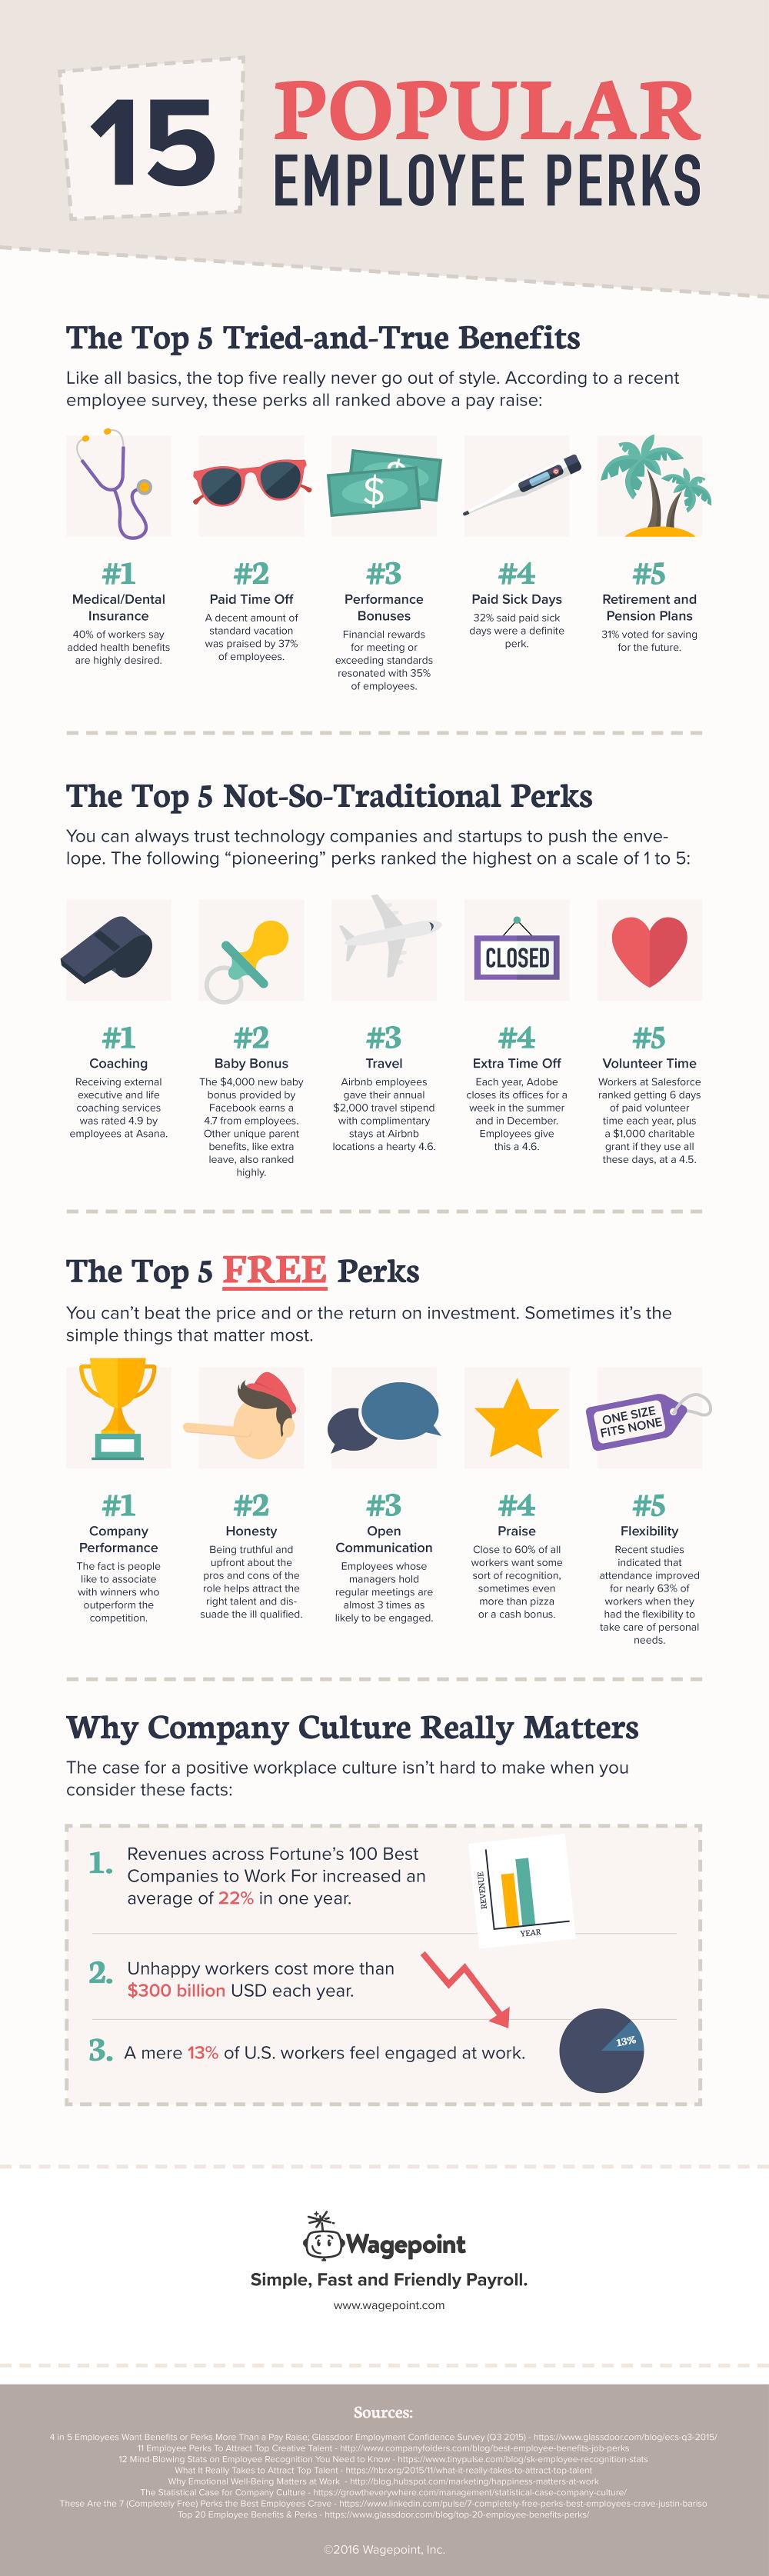 15 Top Employee Perks